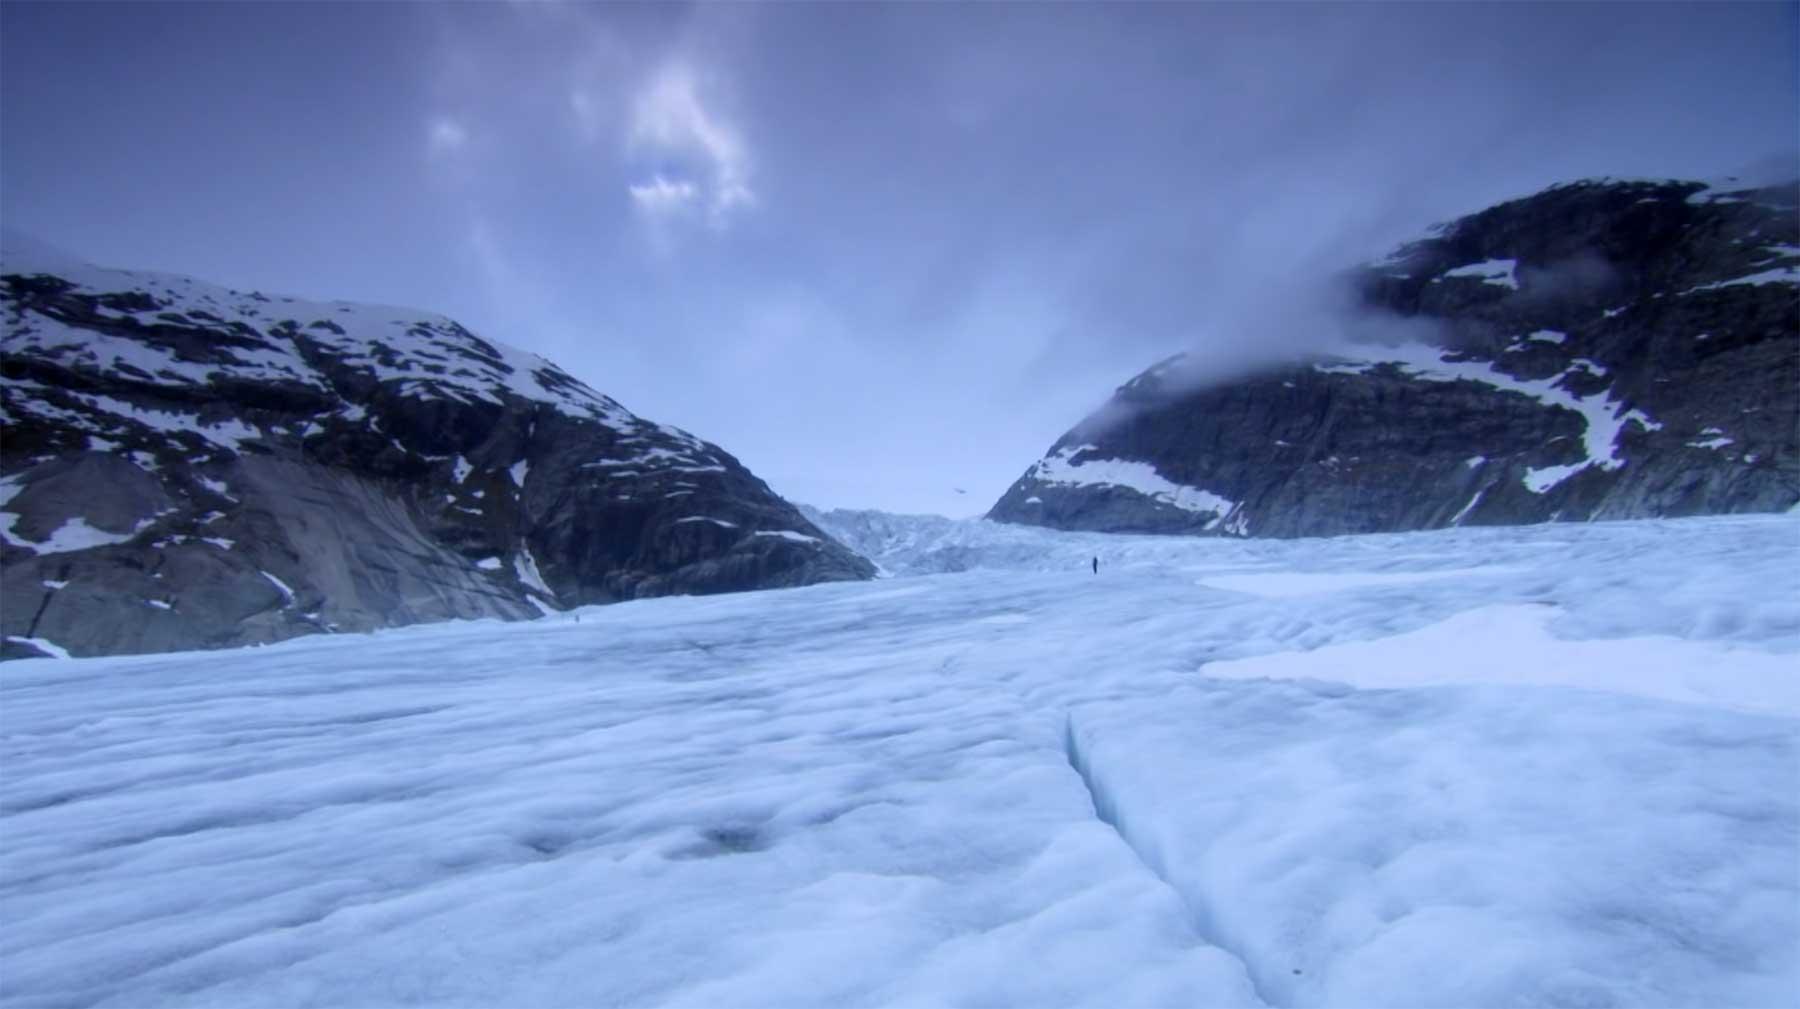 Zeitraffer zeigt, wie Gletscher sich flussartig bewegen gletscherfluss